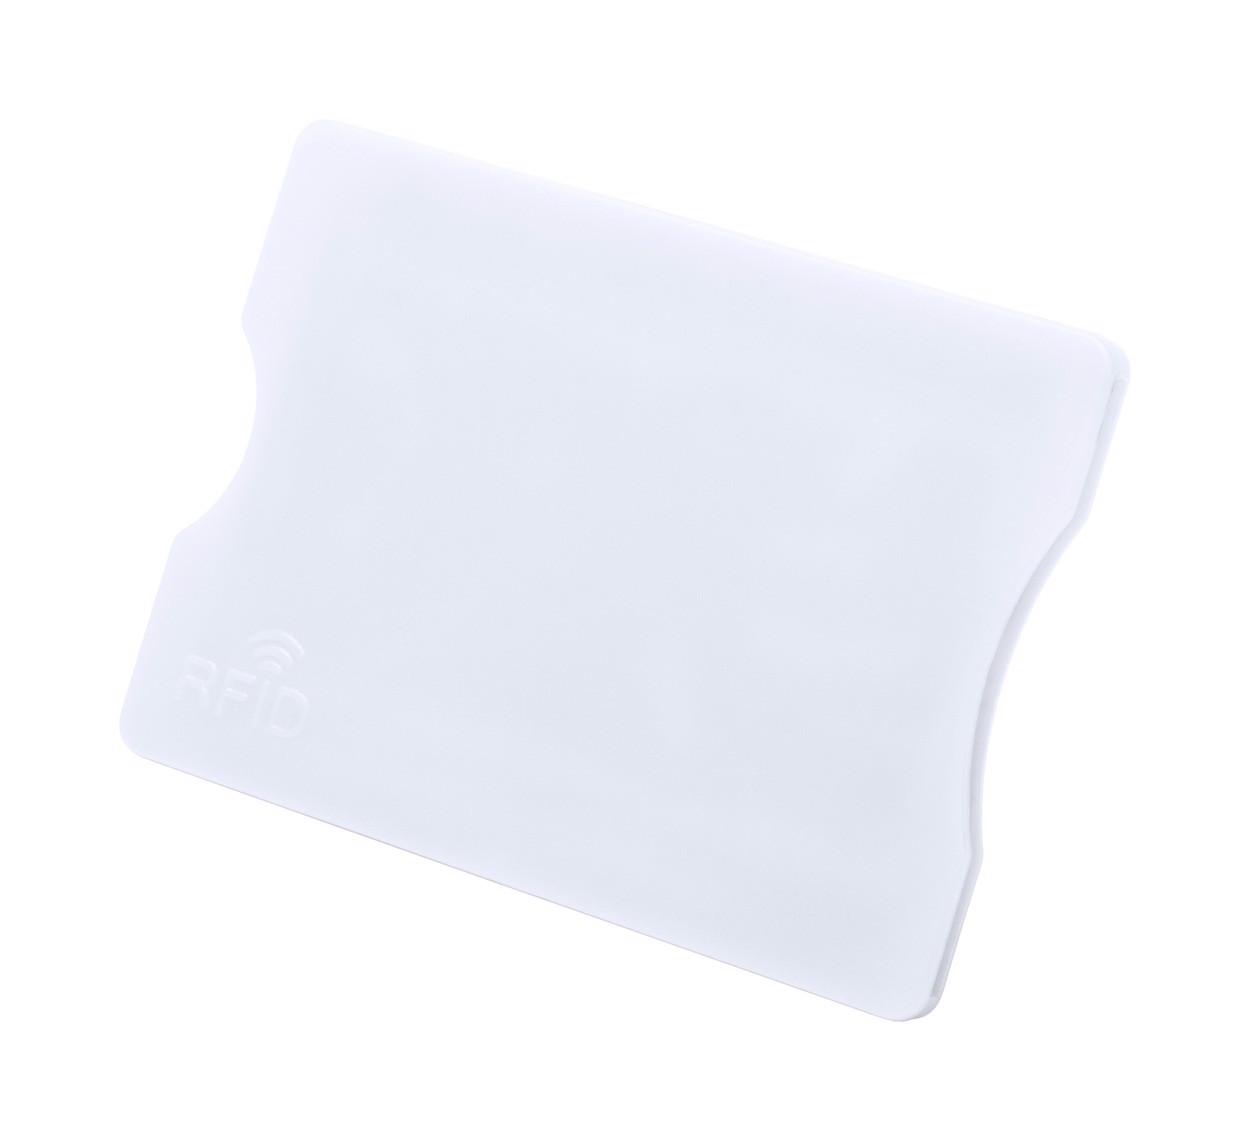 Credit Card Holder Randy - White